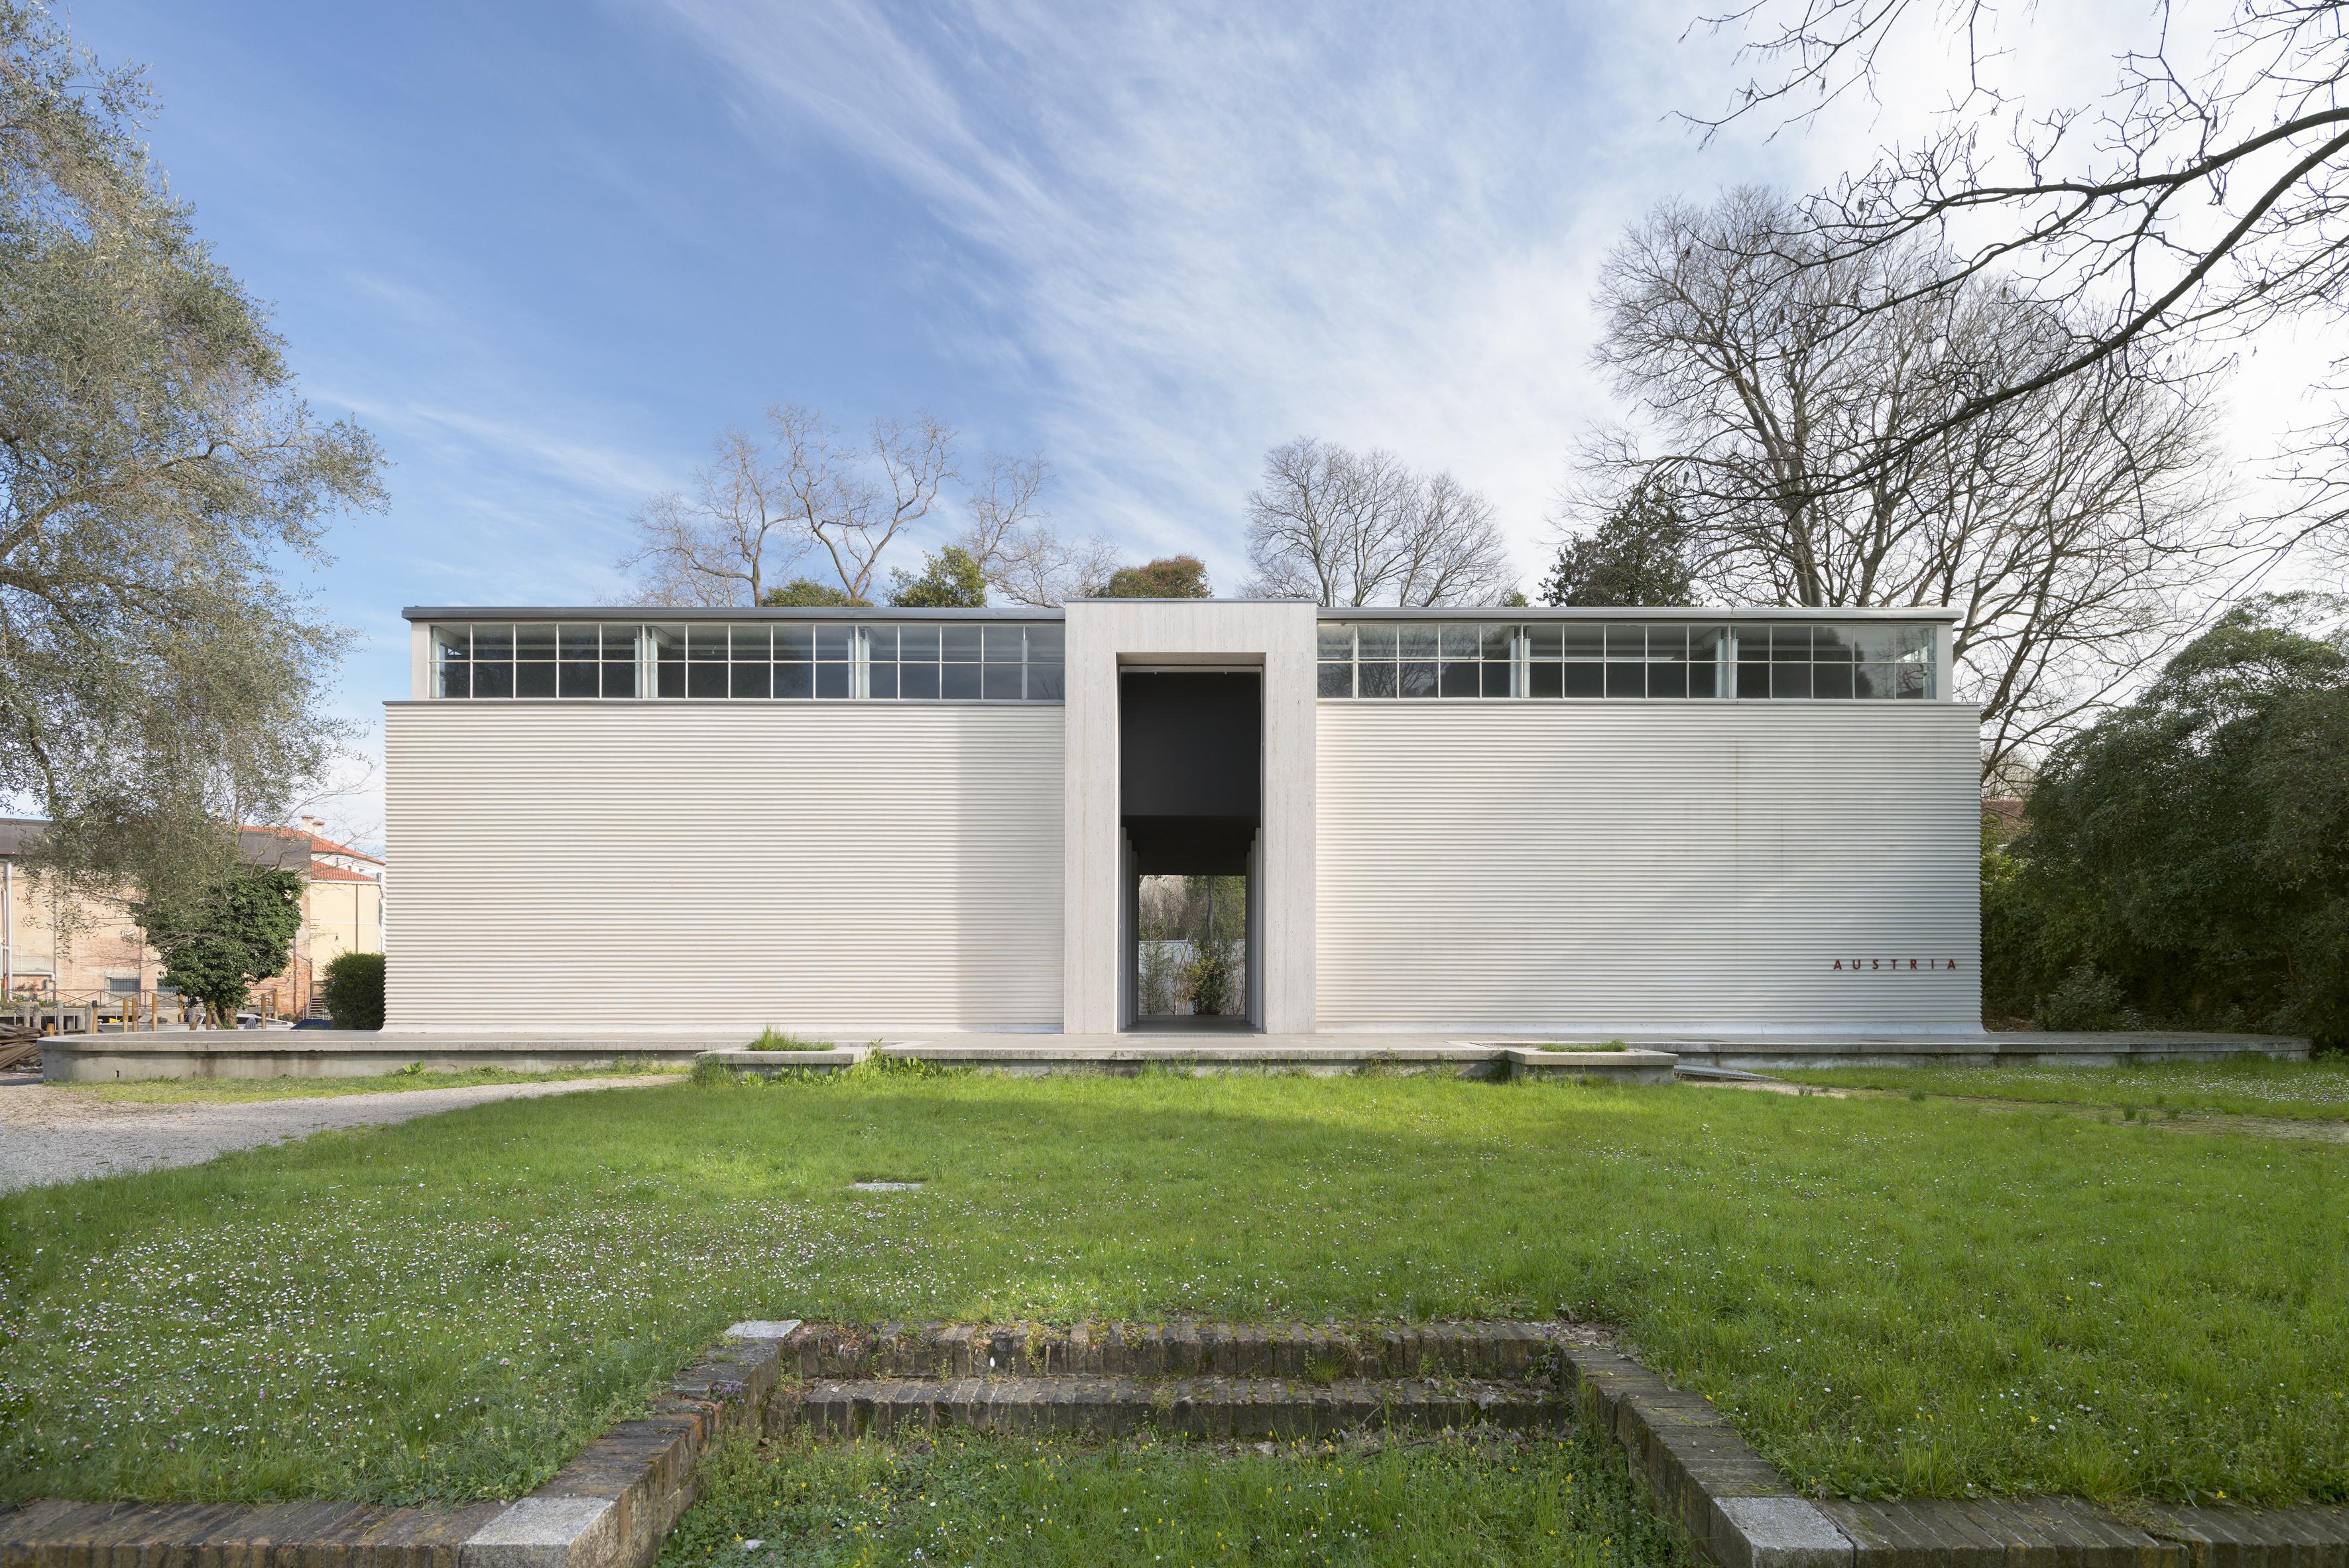 Der Österreichische Pavillon – La Biennale di Venezia, 2015, Archiv HZ Foto: Georg Petermichl